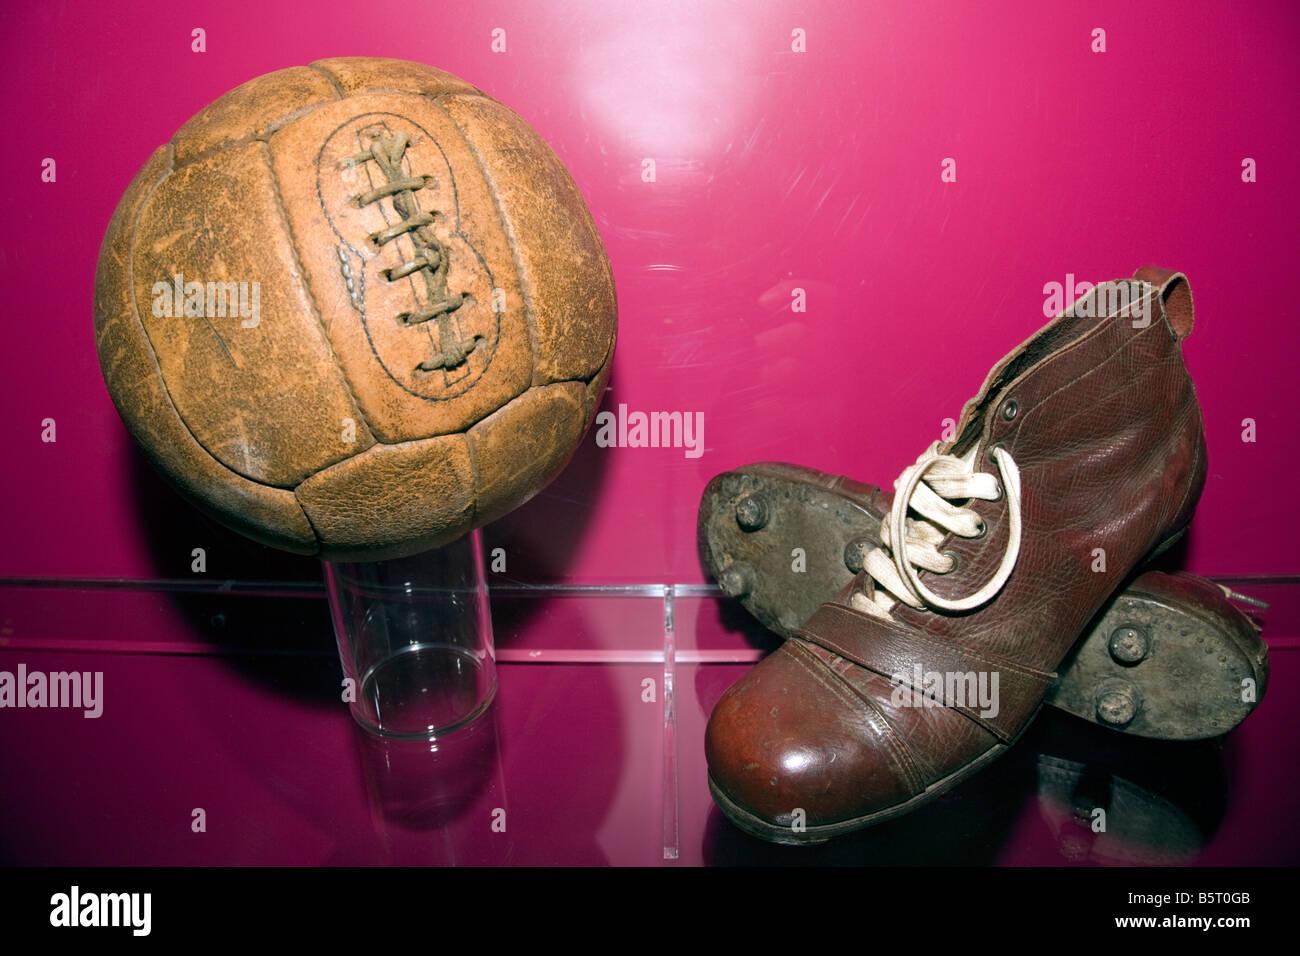 From Fran Tarkentons cleats to leather helmet dear to Bud